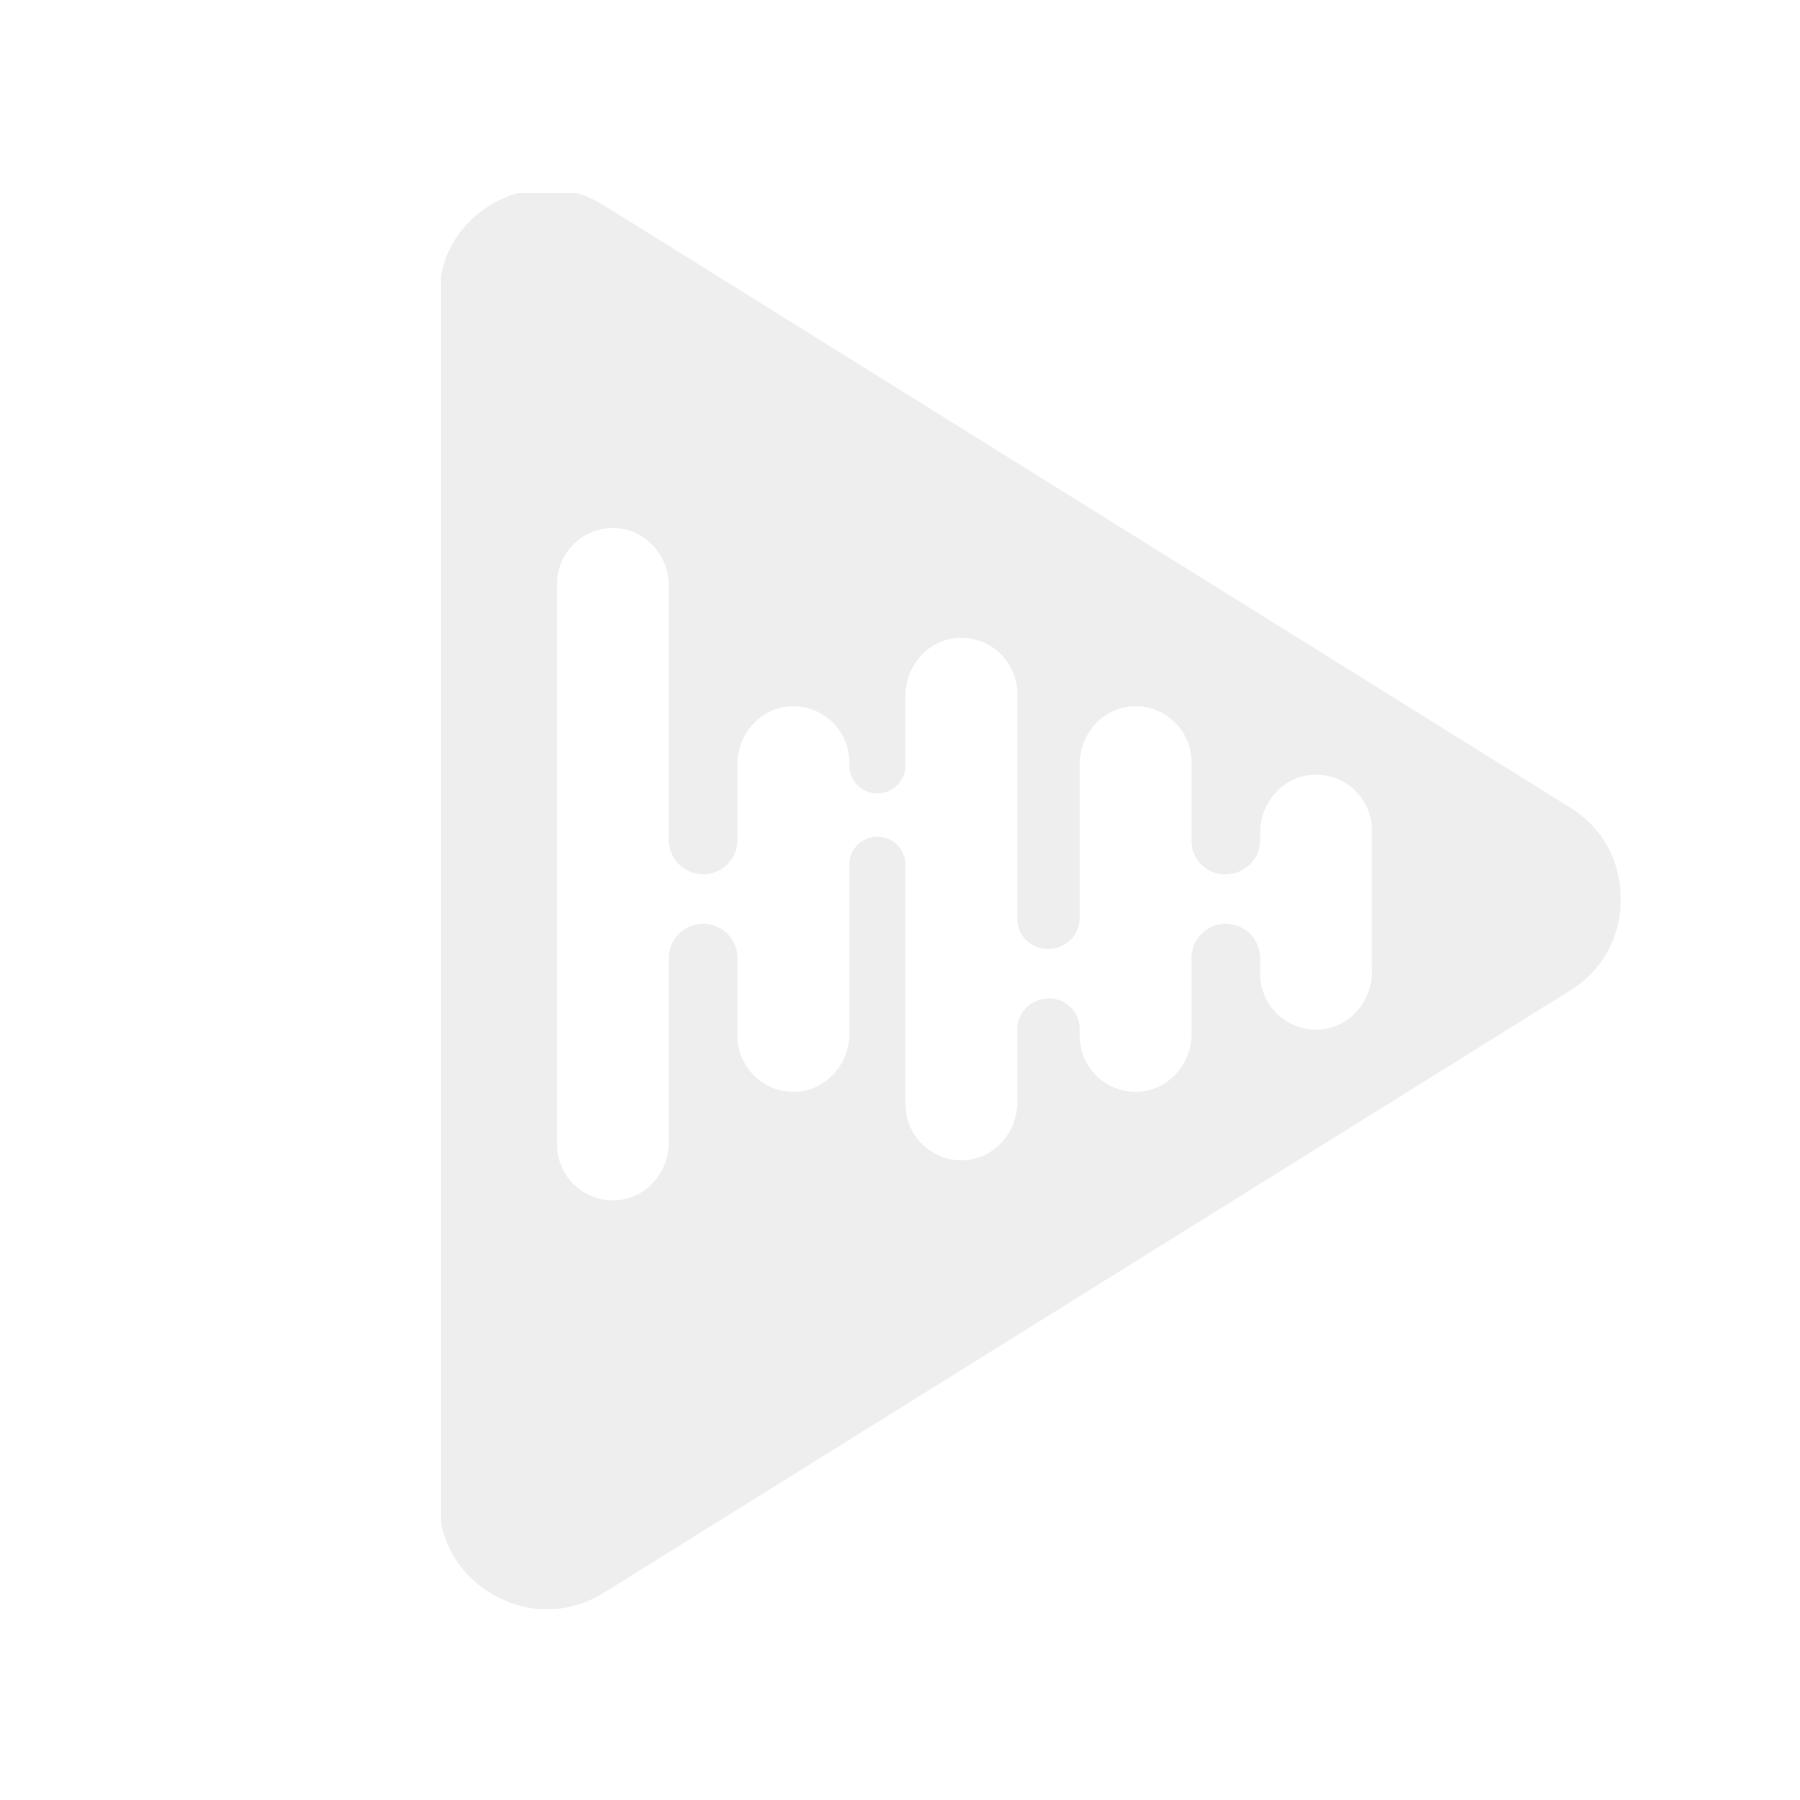 Skoddejuice Coconut Aroma